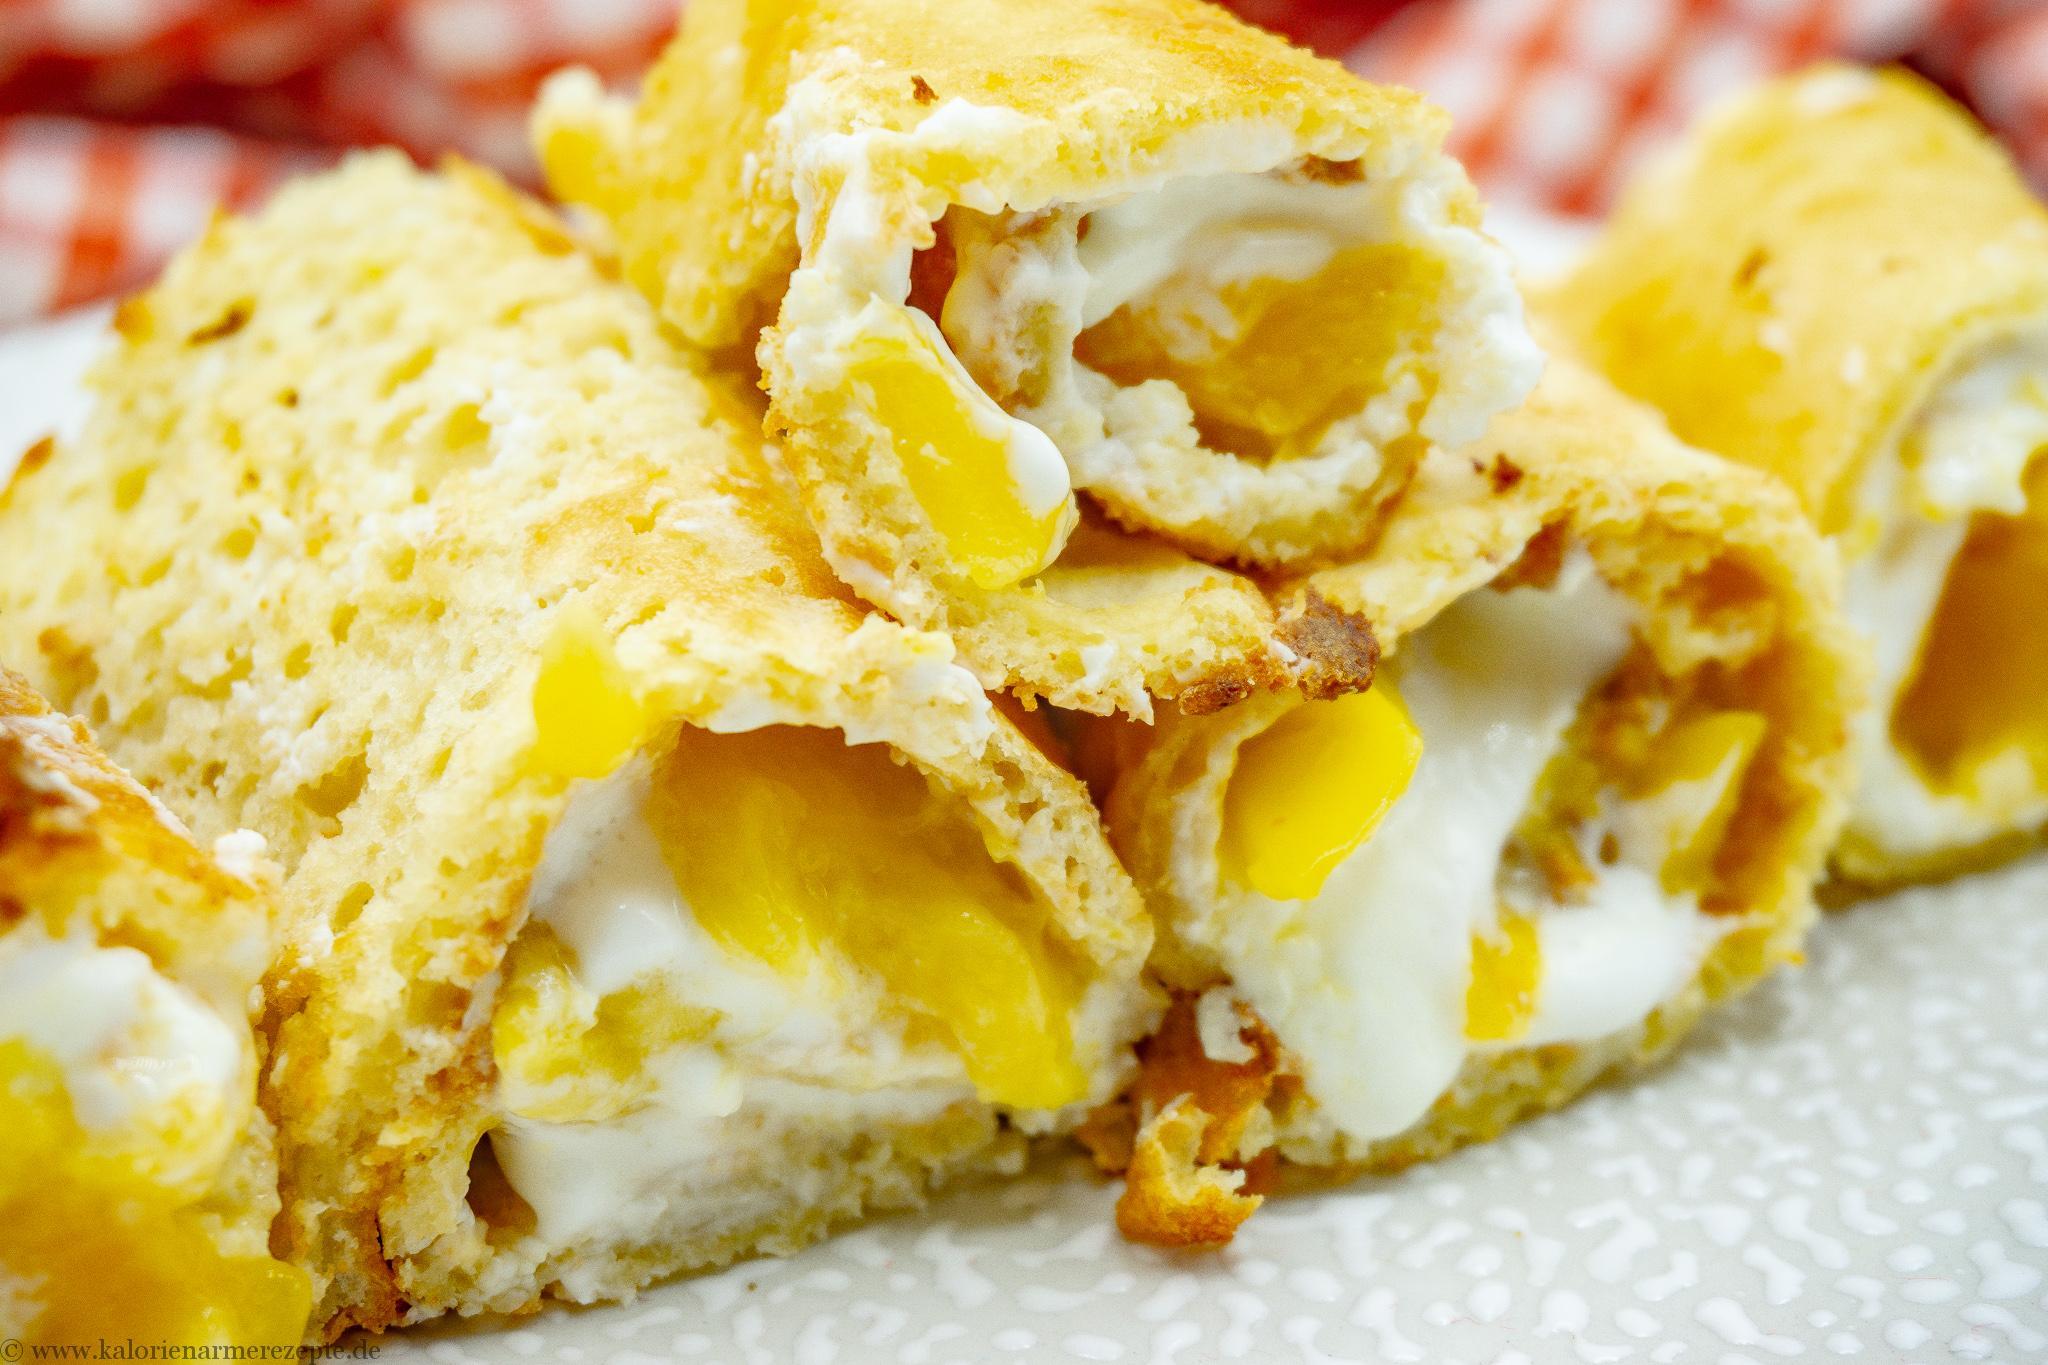 Mango Biskuitrolle - Kalorienarmes Dessert Rezept ohne Zucker